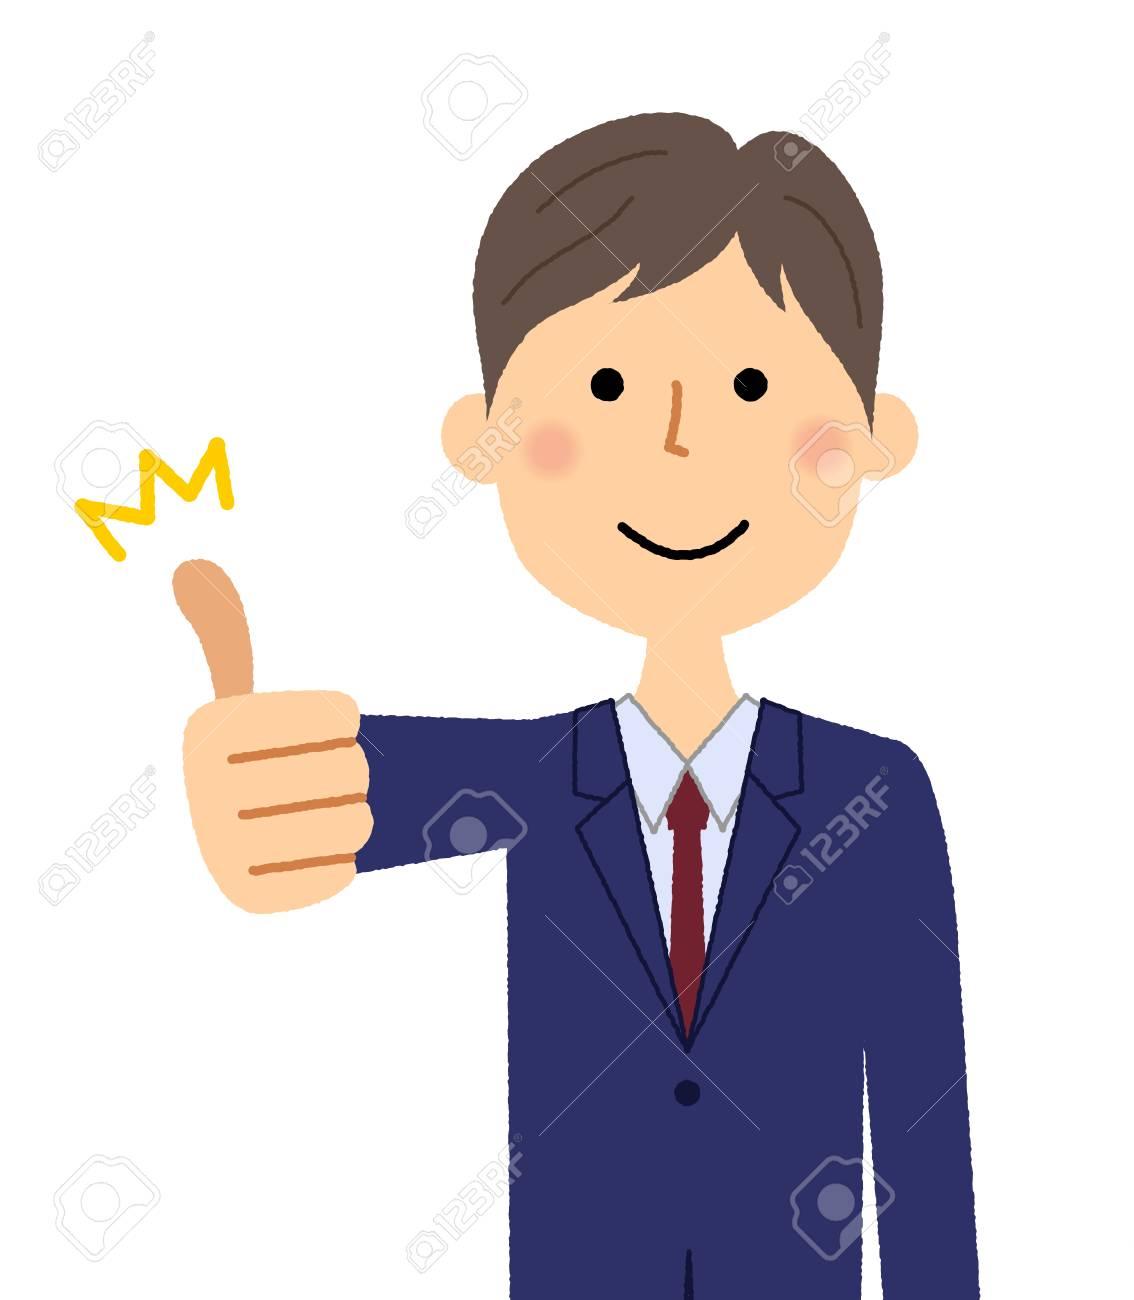 Businessman, Thumbs up - 112656697